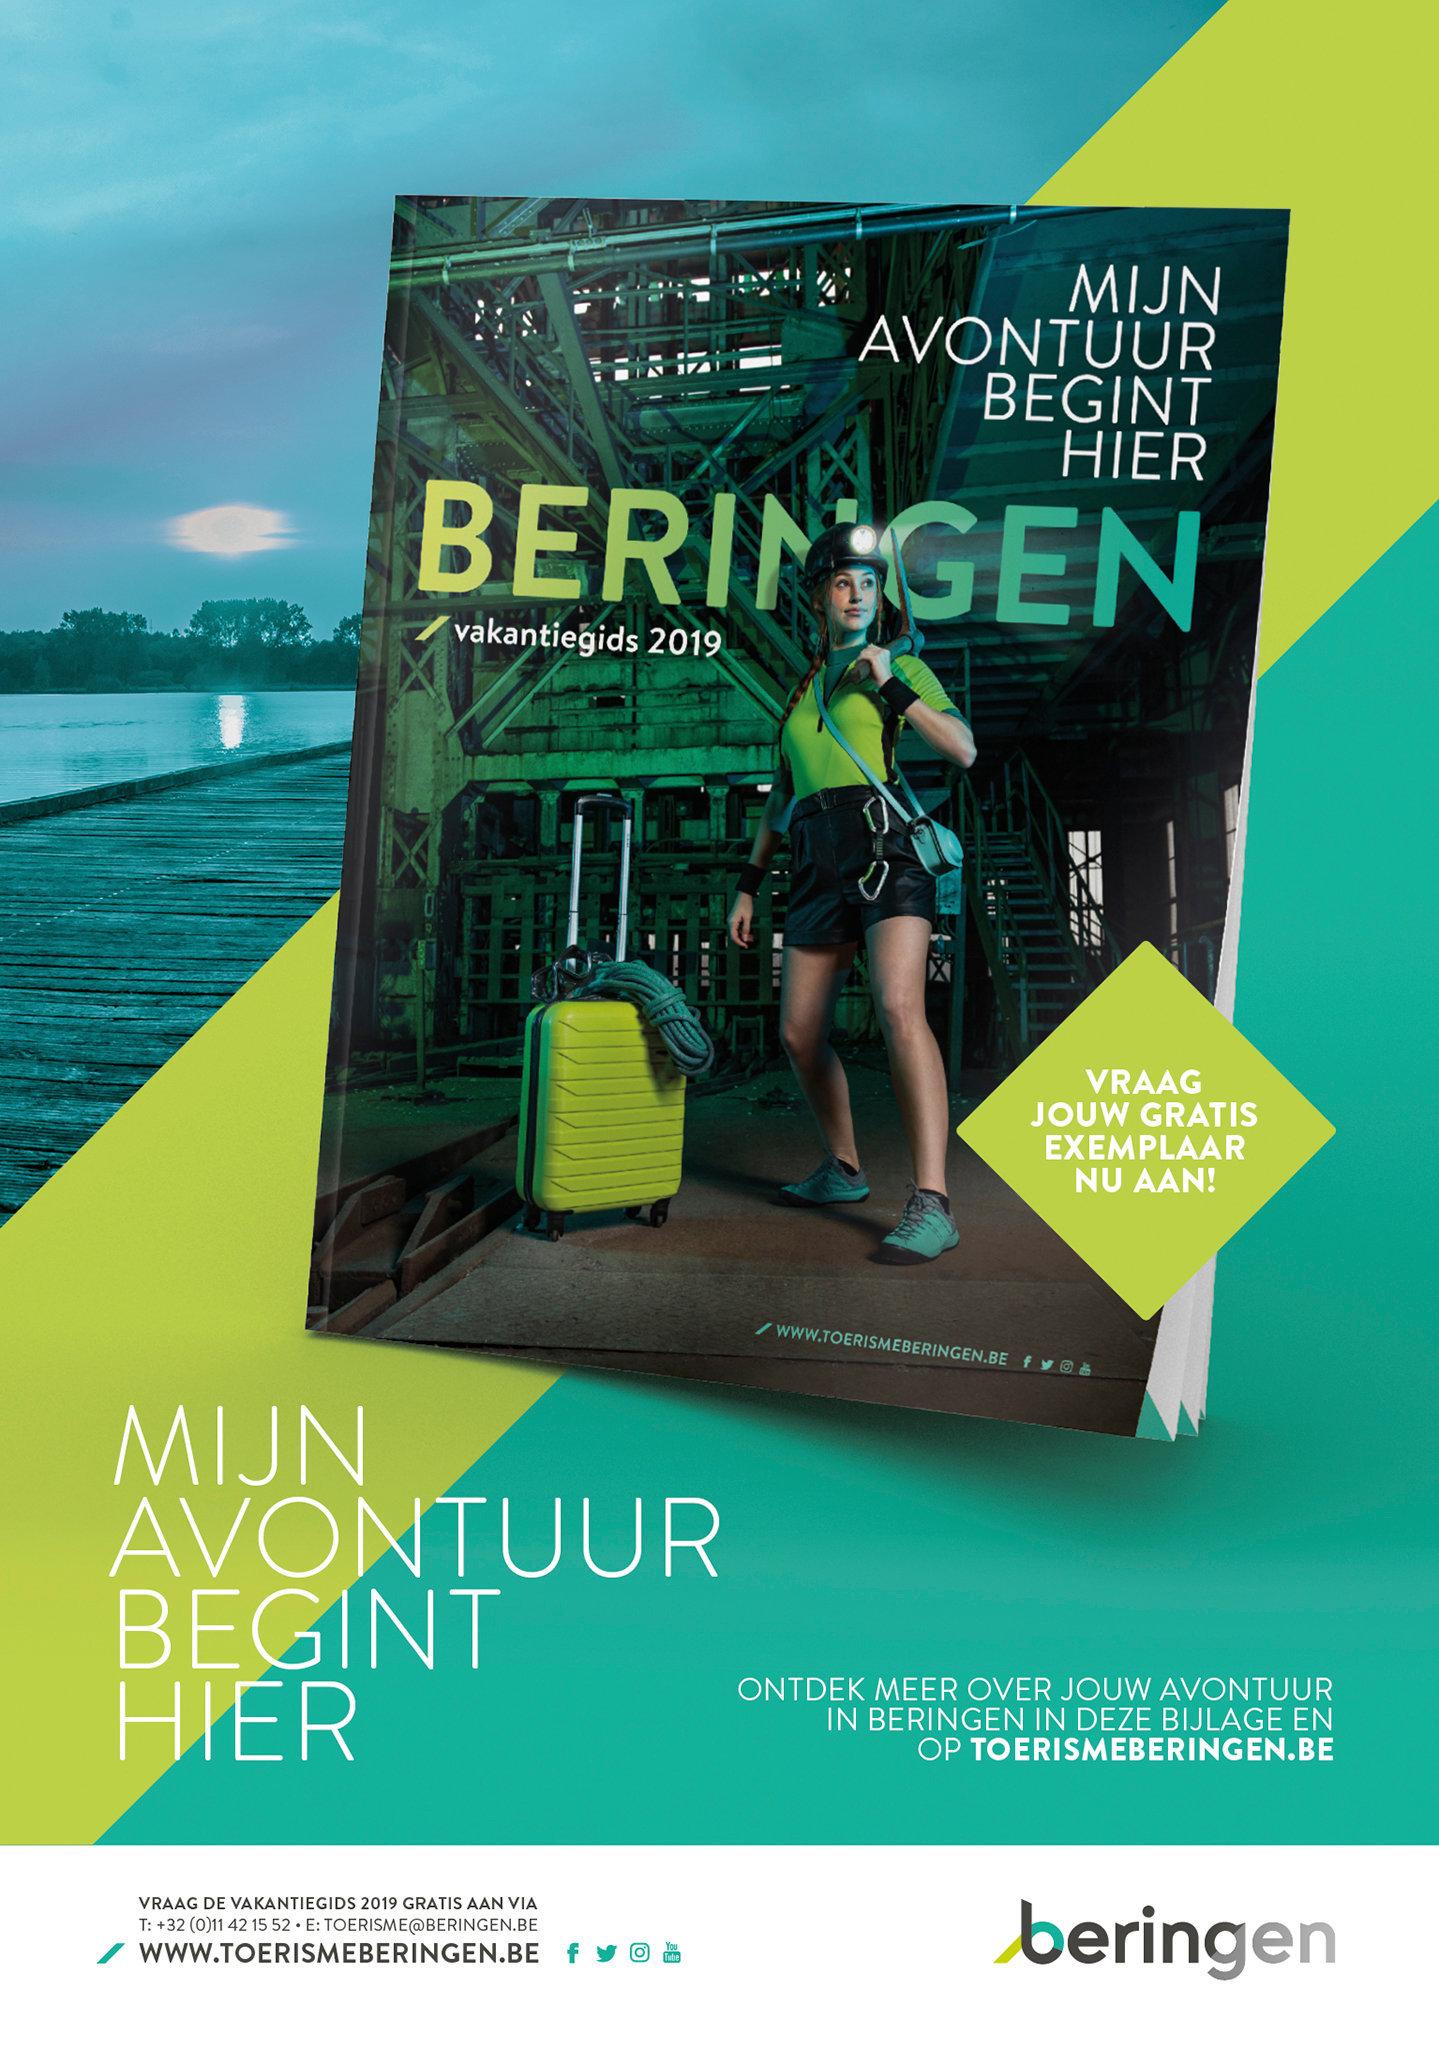 Toerisme Beringen i.s.m. Imagica